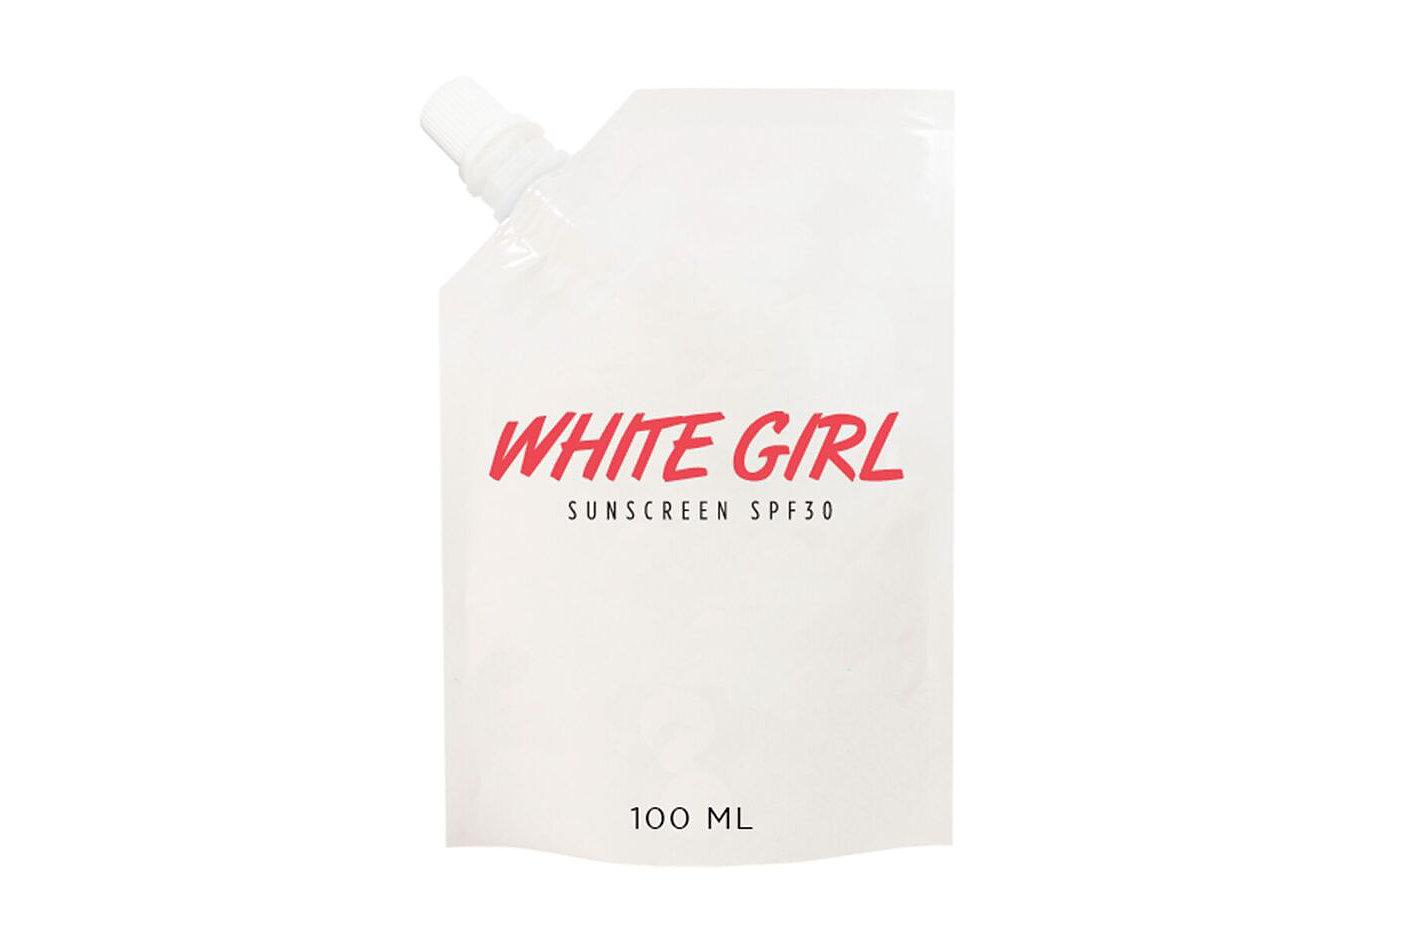 white girl sunscreen pouch